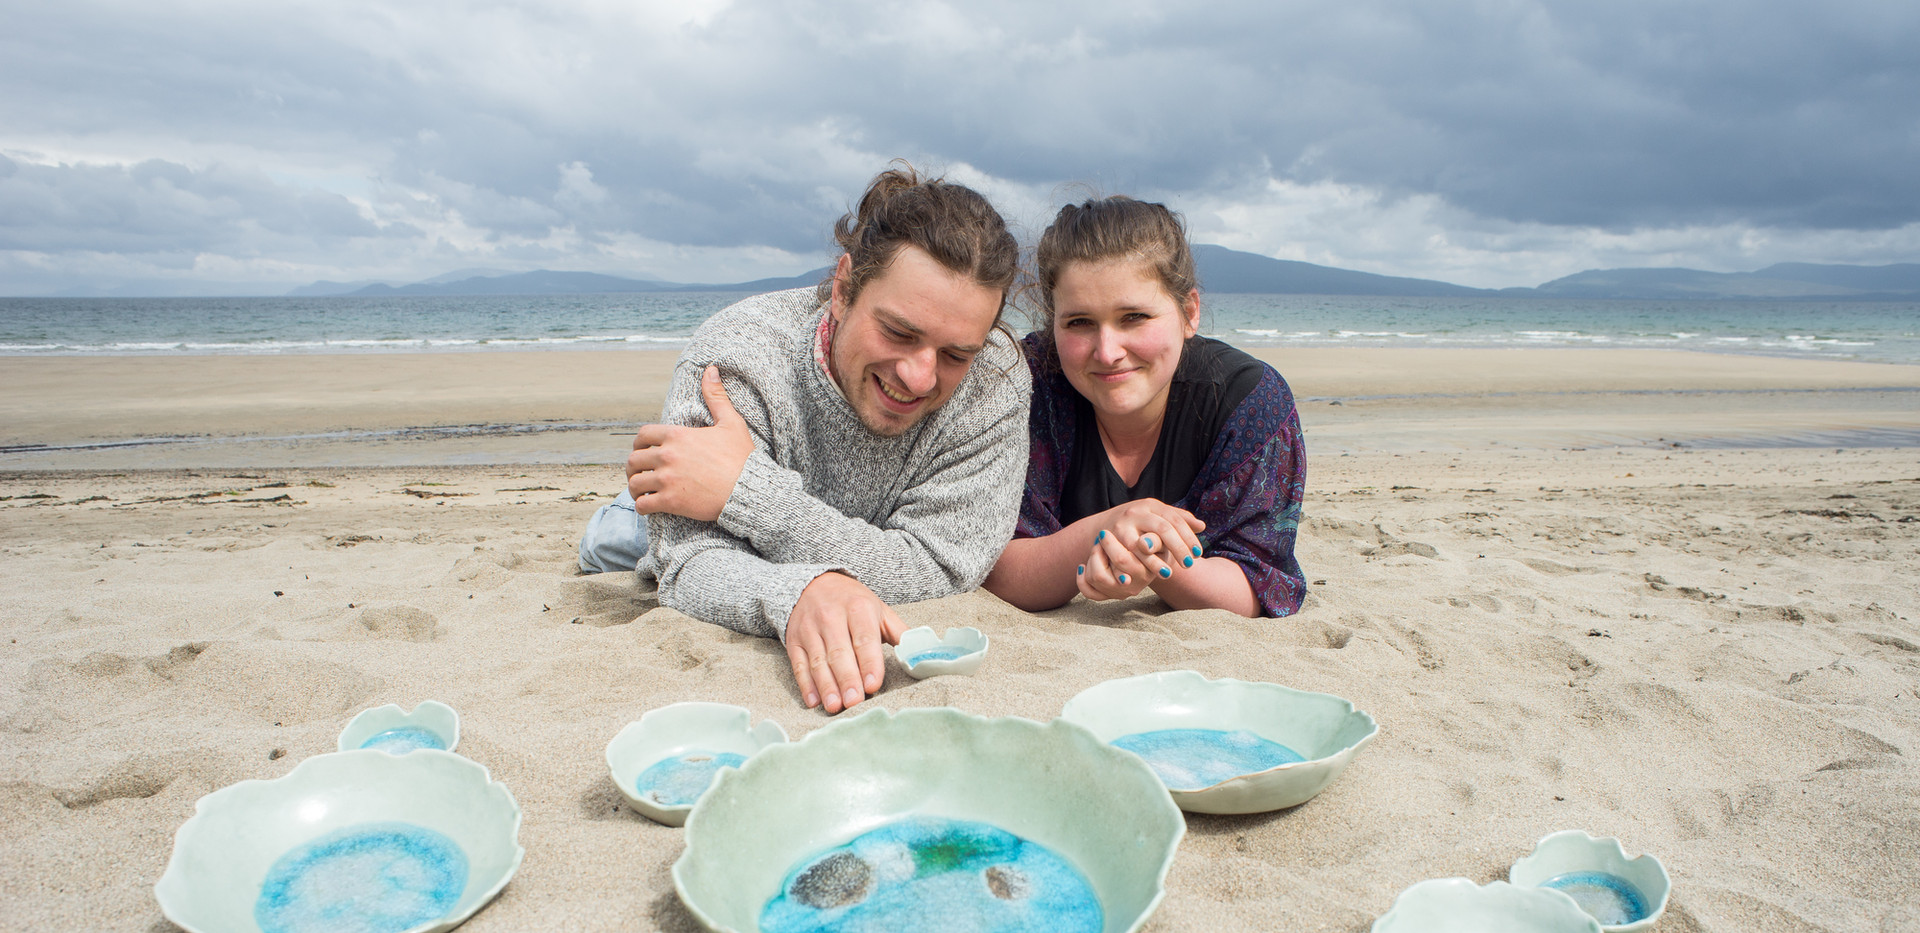 Ella and Lukasz Szczerbak The Mood Designs Irish ceramics inspired by wild atlantic way sea bowls pottery handmade in ireland